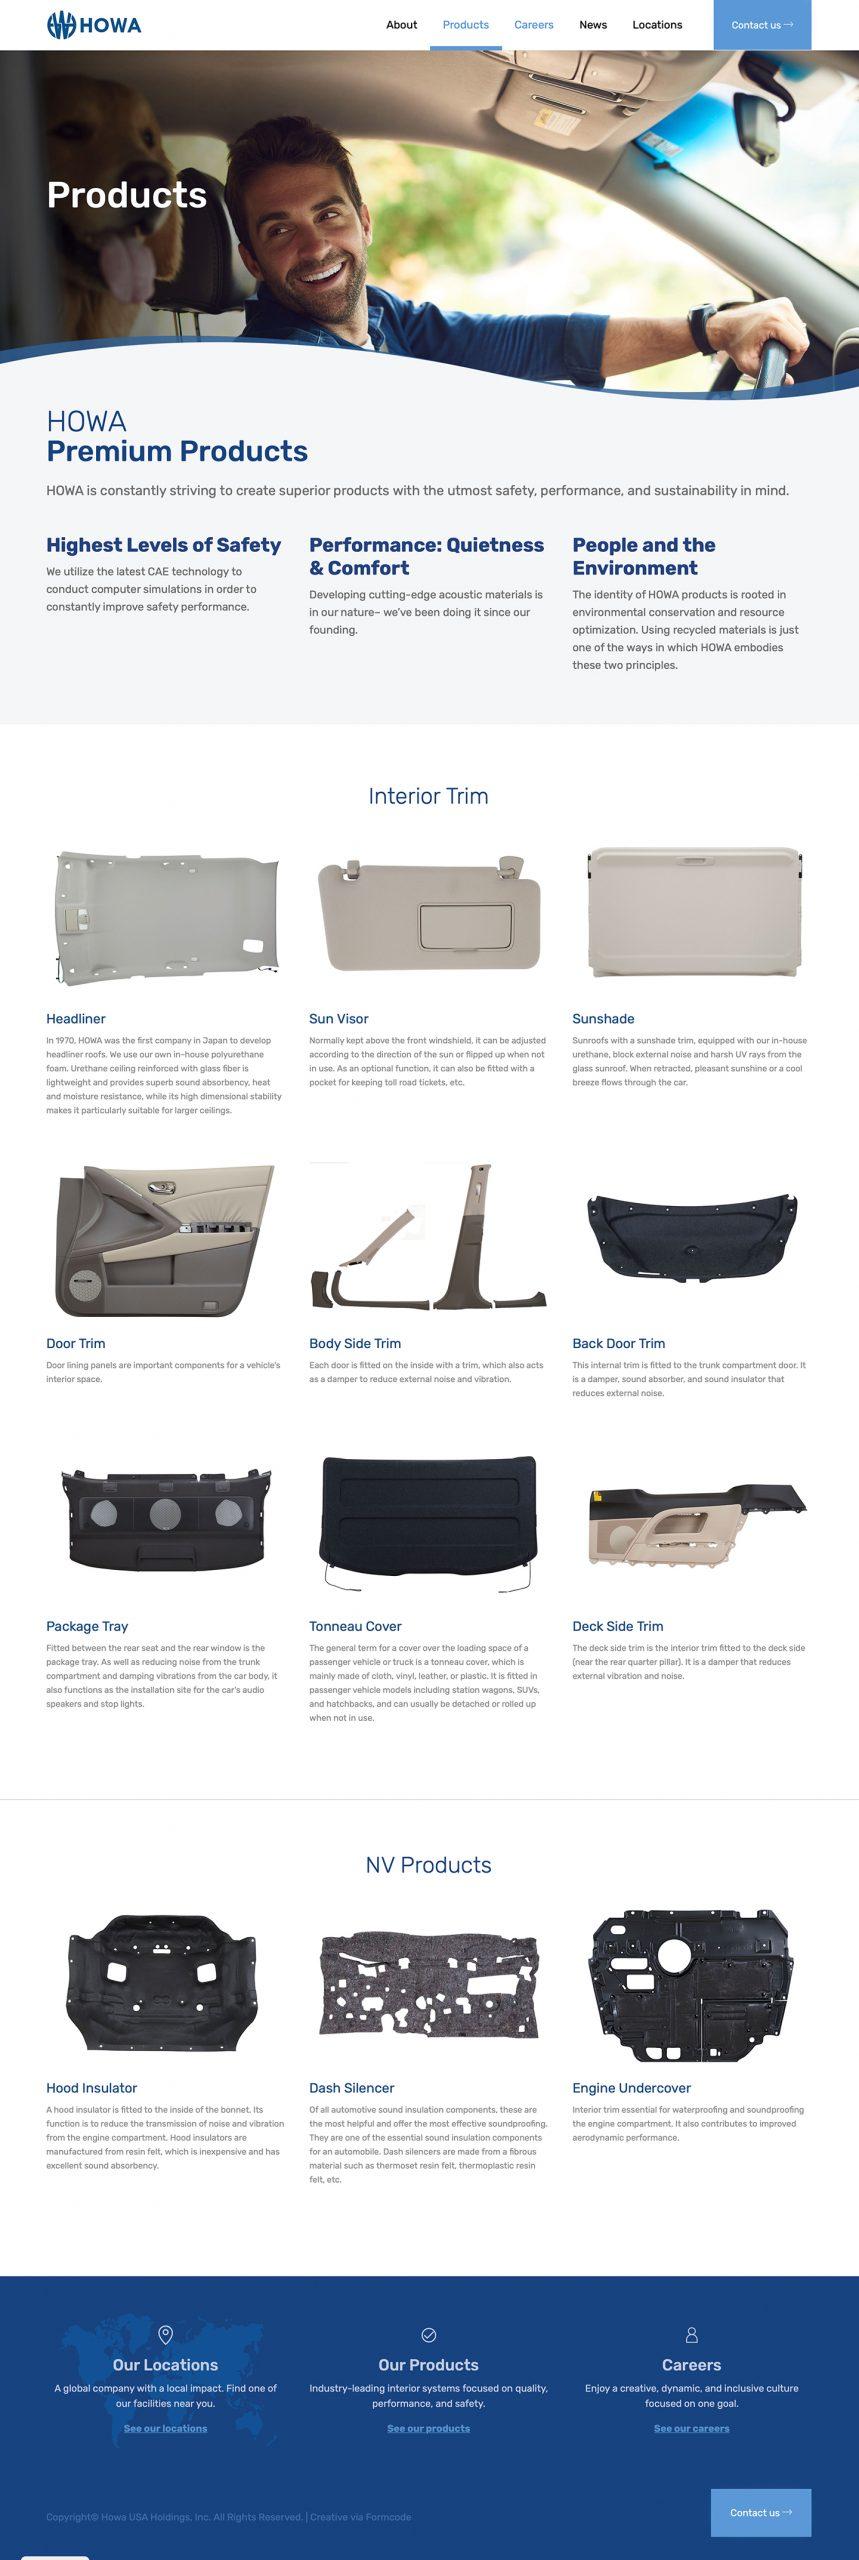 HOWA Website - Automotive Parts Page